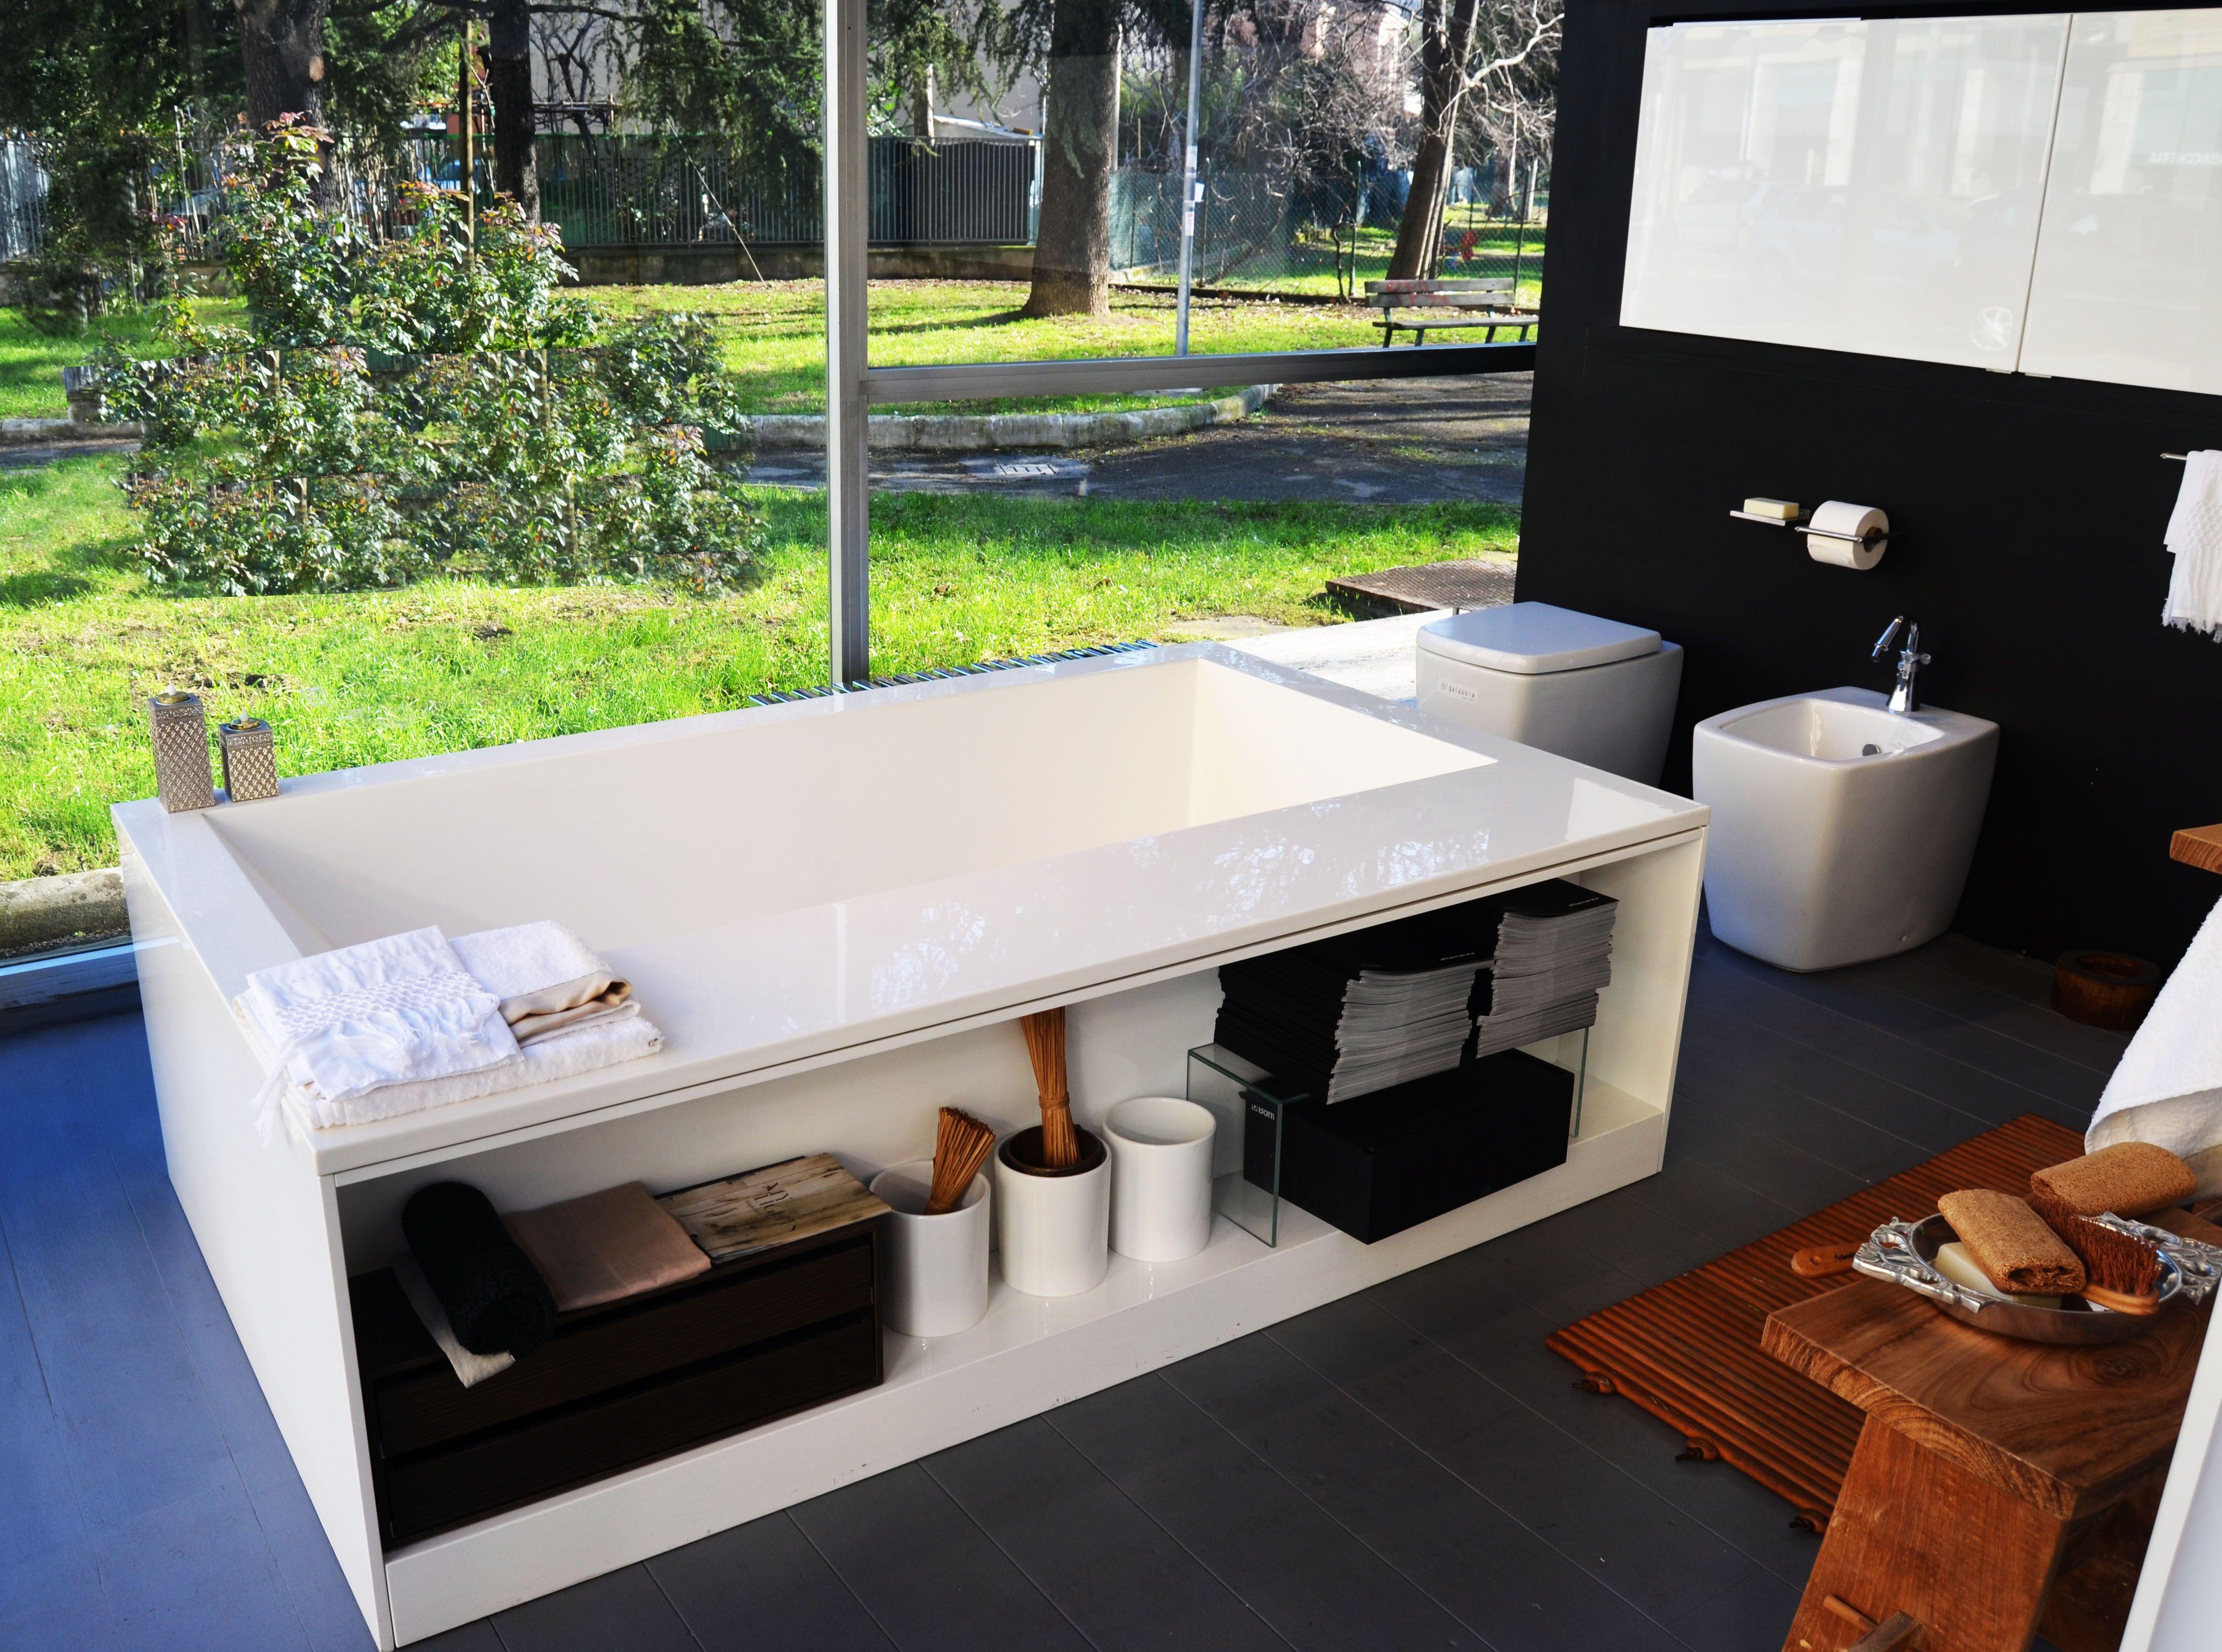 Vasca boffi bagno spugne aqua di claudia modelli showroom san donato pinterest showroom - Modelli di bagno ...